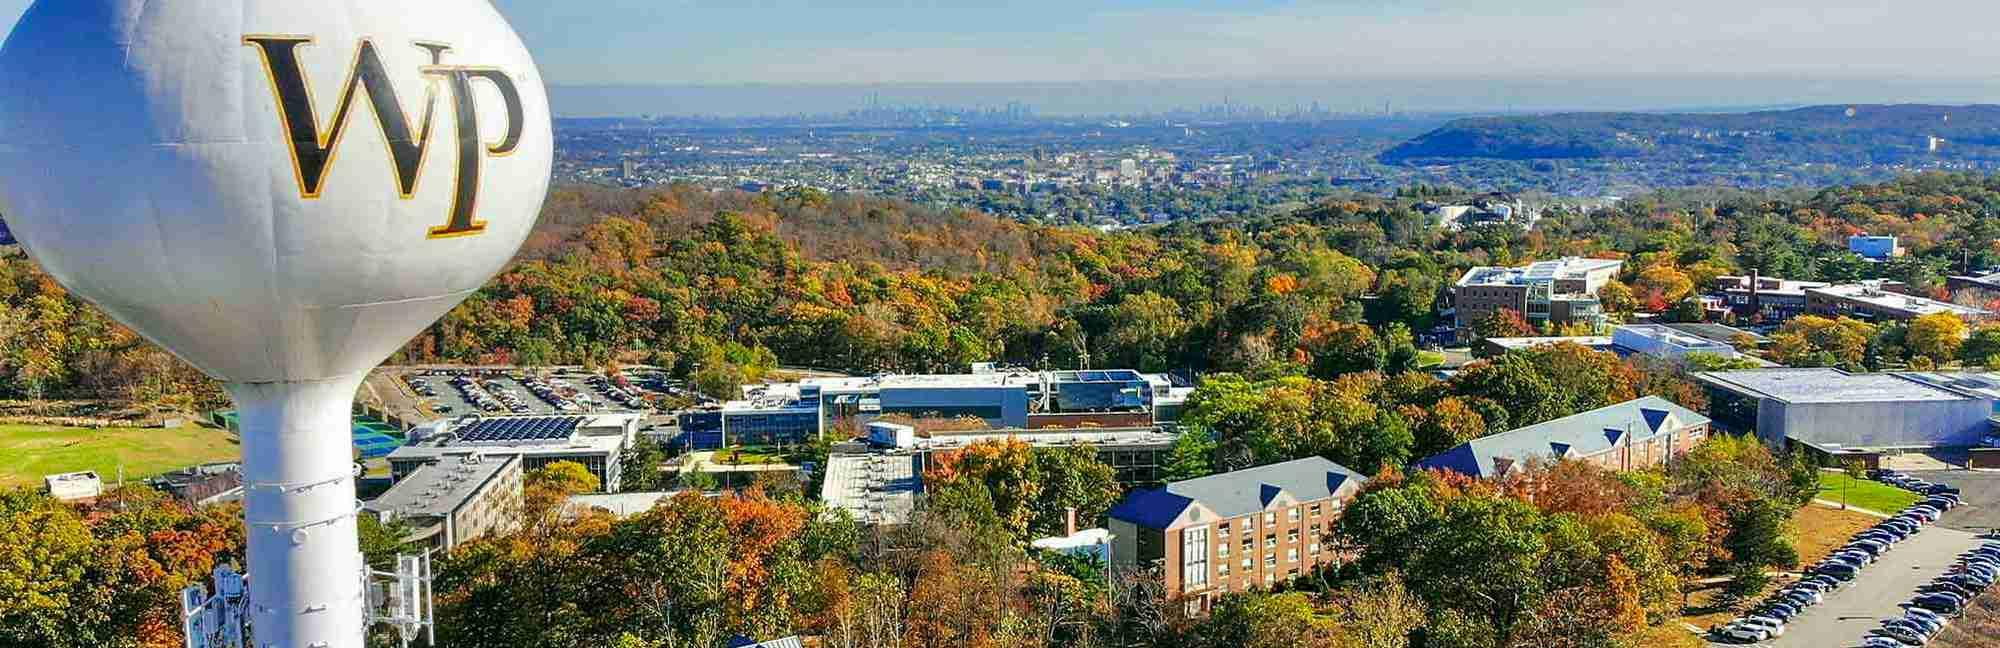 William Paterson University of New Jersey - Niche